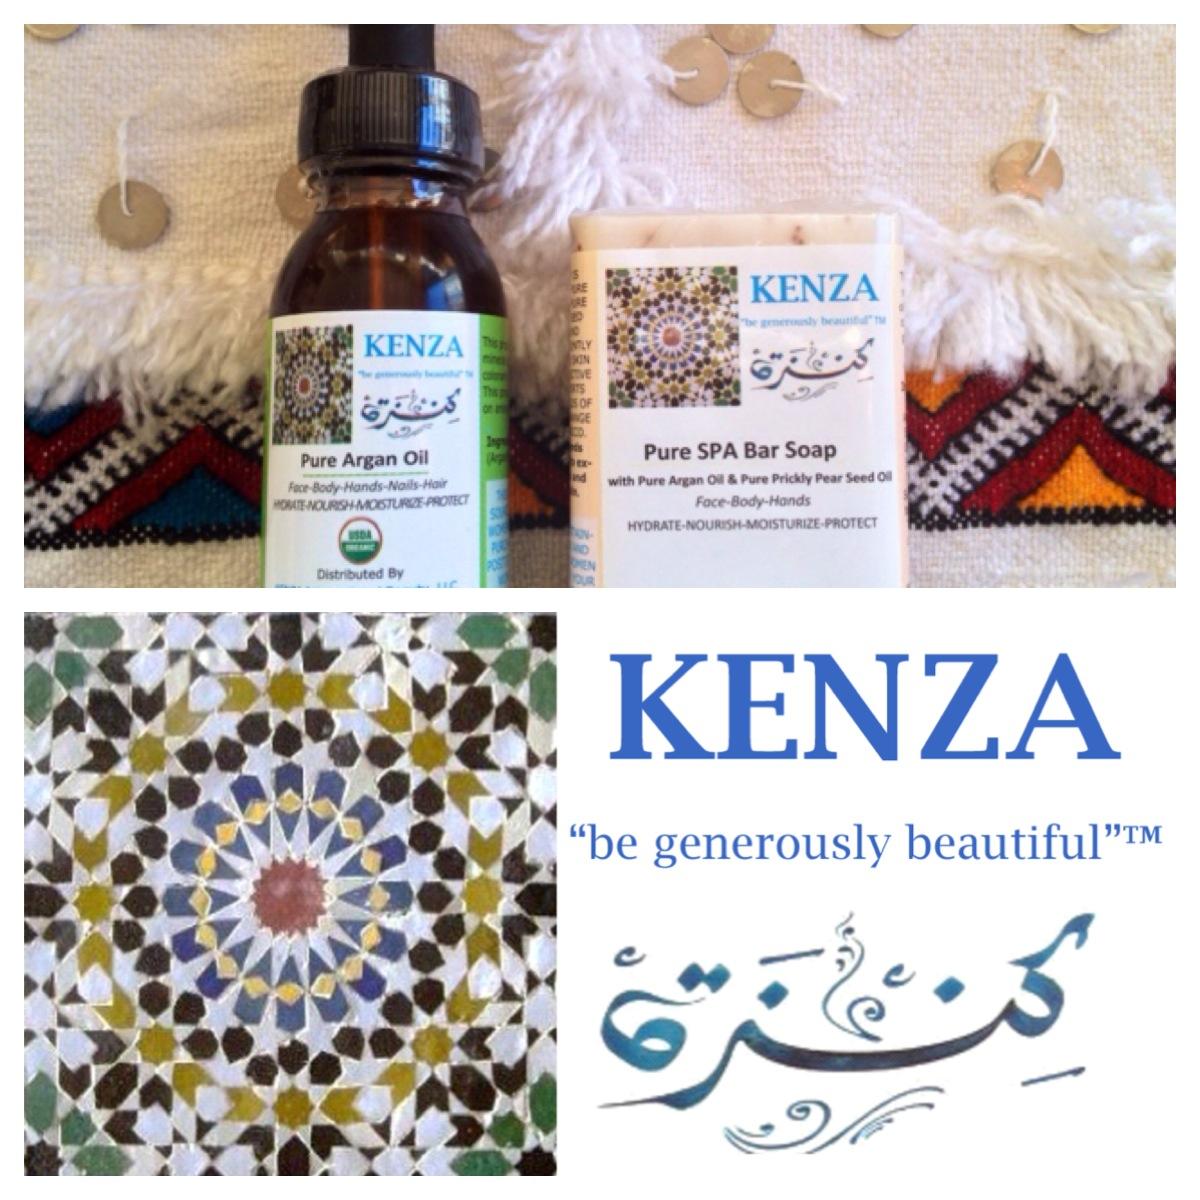 KENZA International Beauty